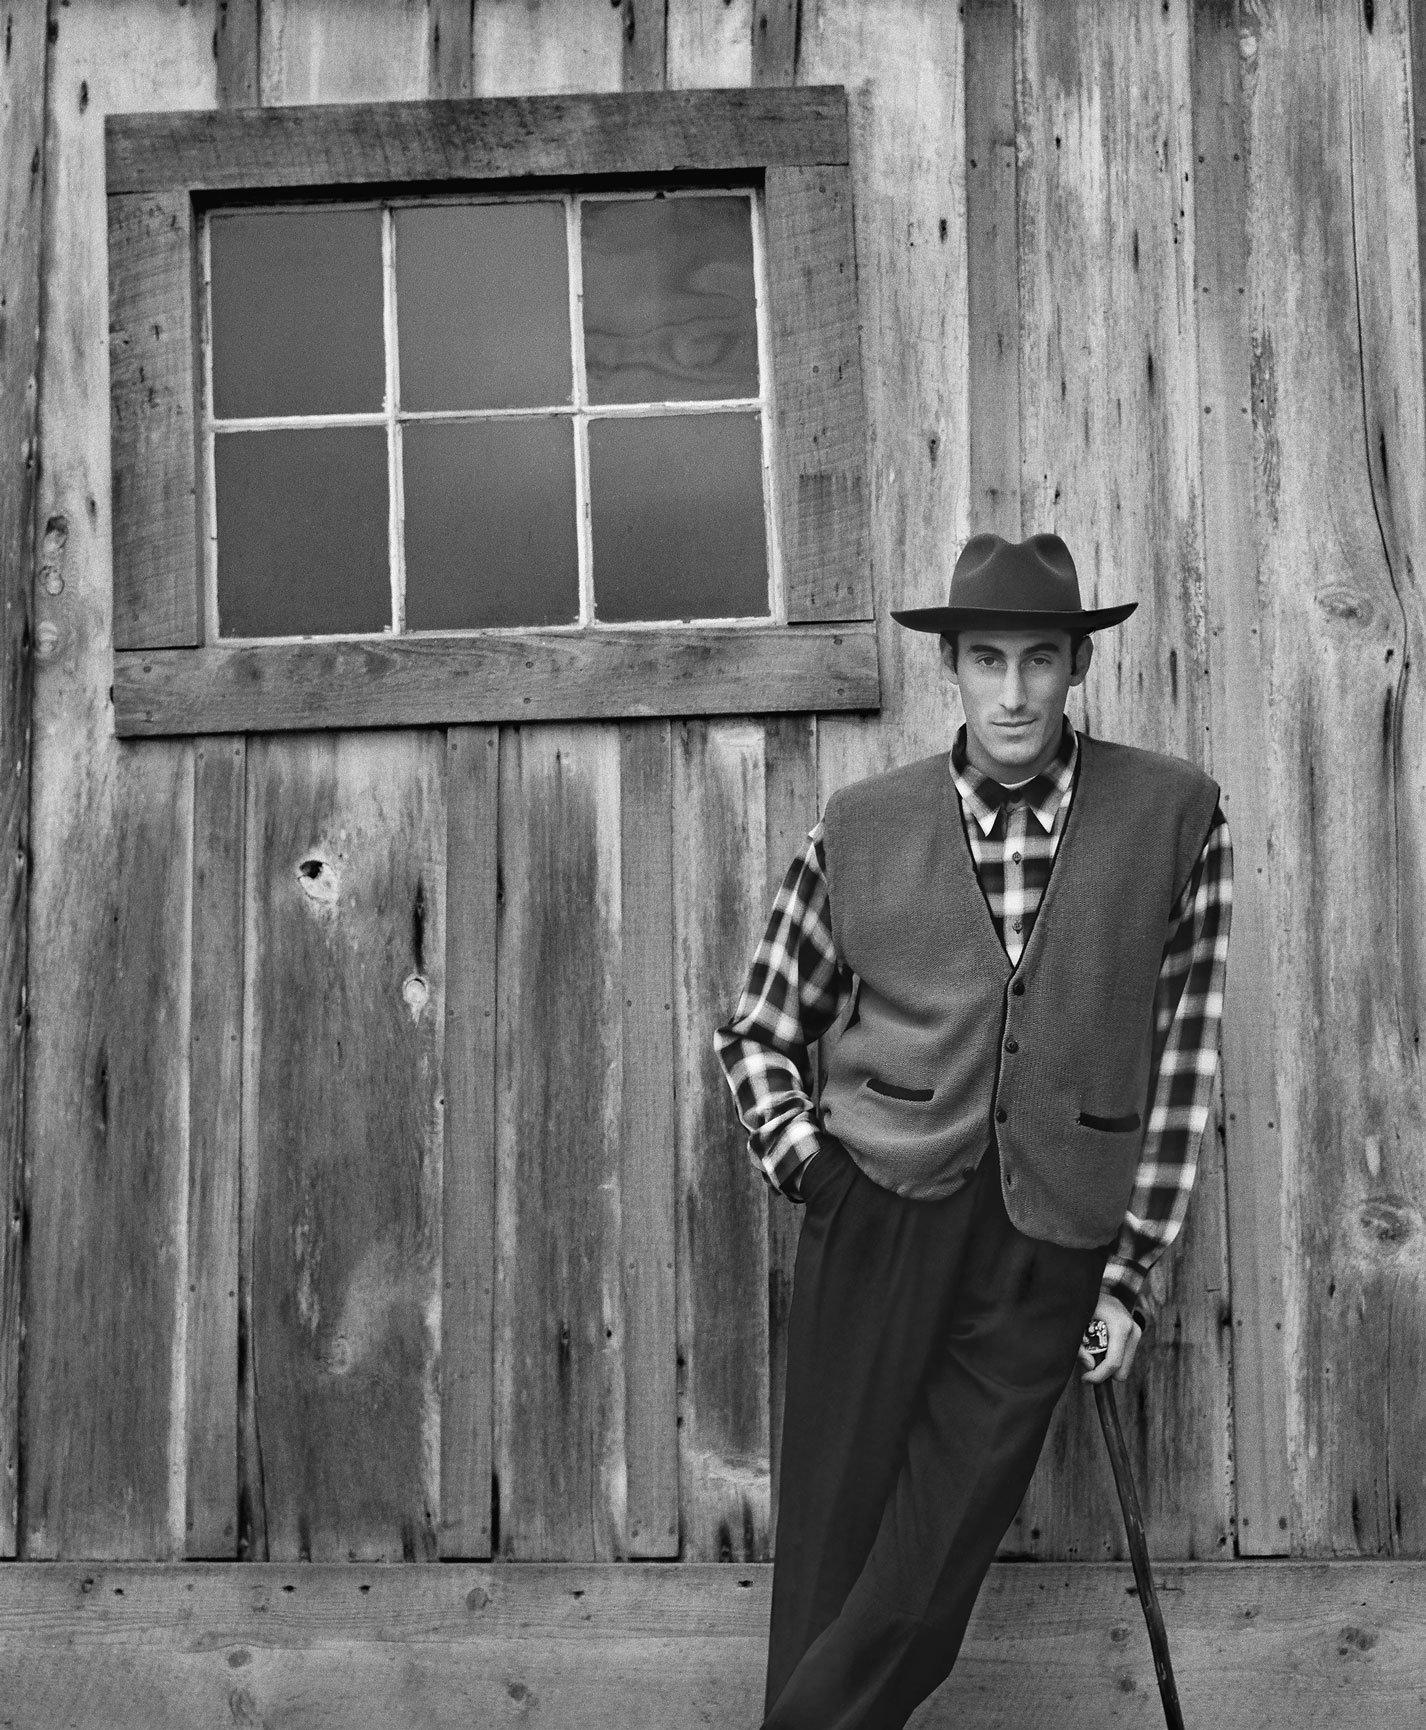 B&W, Fashion Photography, Carmel, California, Hassleblad Film Photography.